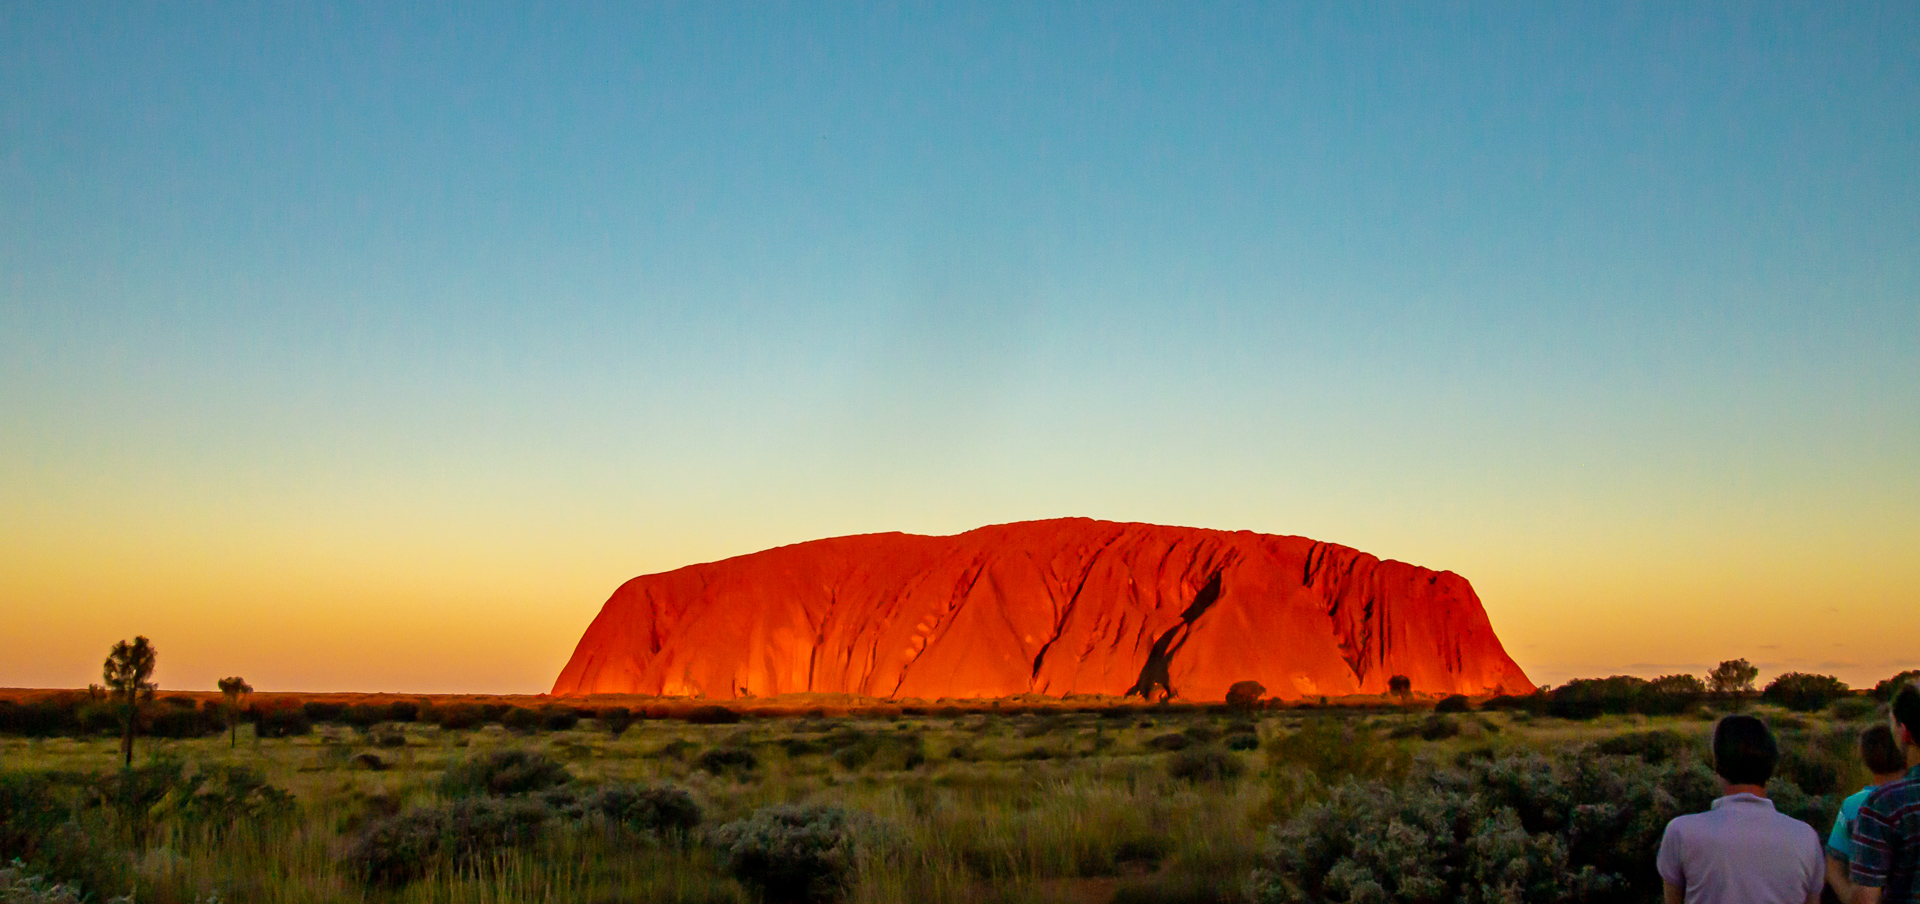 Uluru at Sunset - 2014